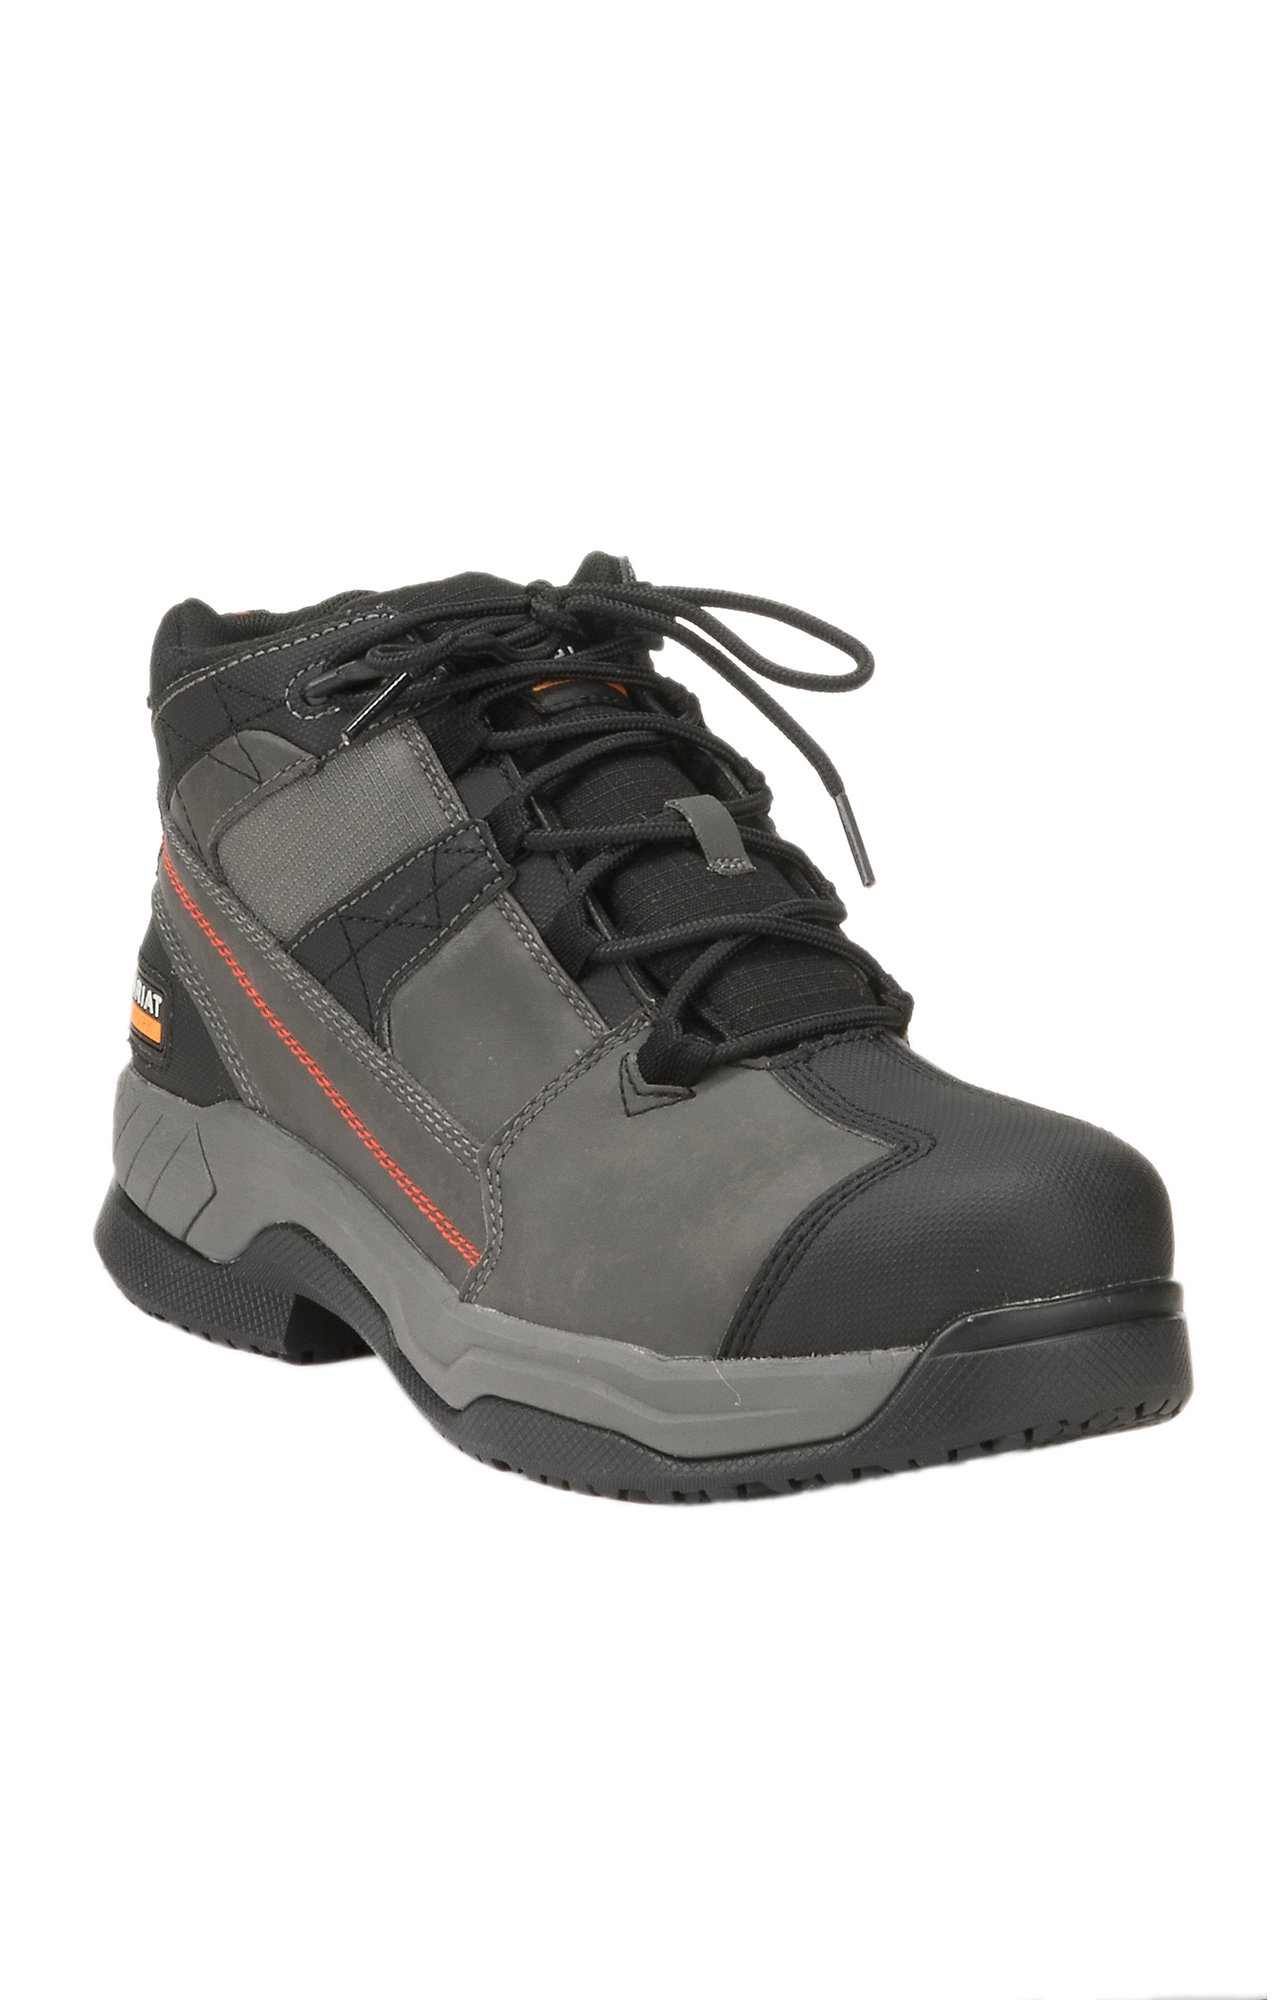 Ariat Men's Black and Grey Contender Steel Toe Work Boot | Cavender's